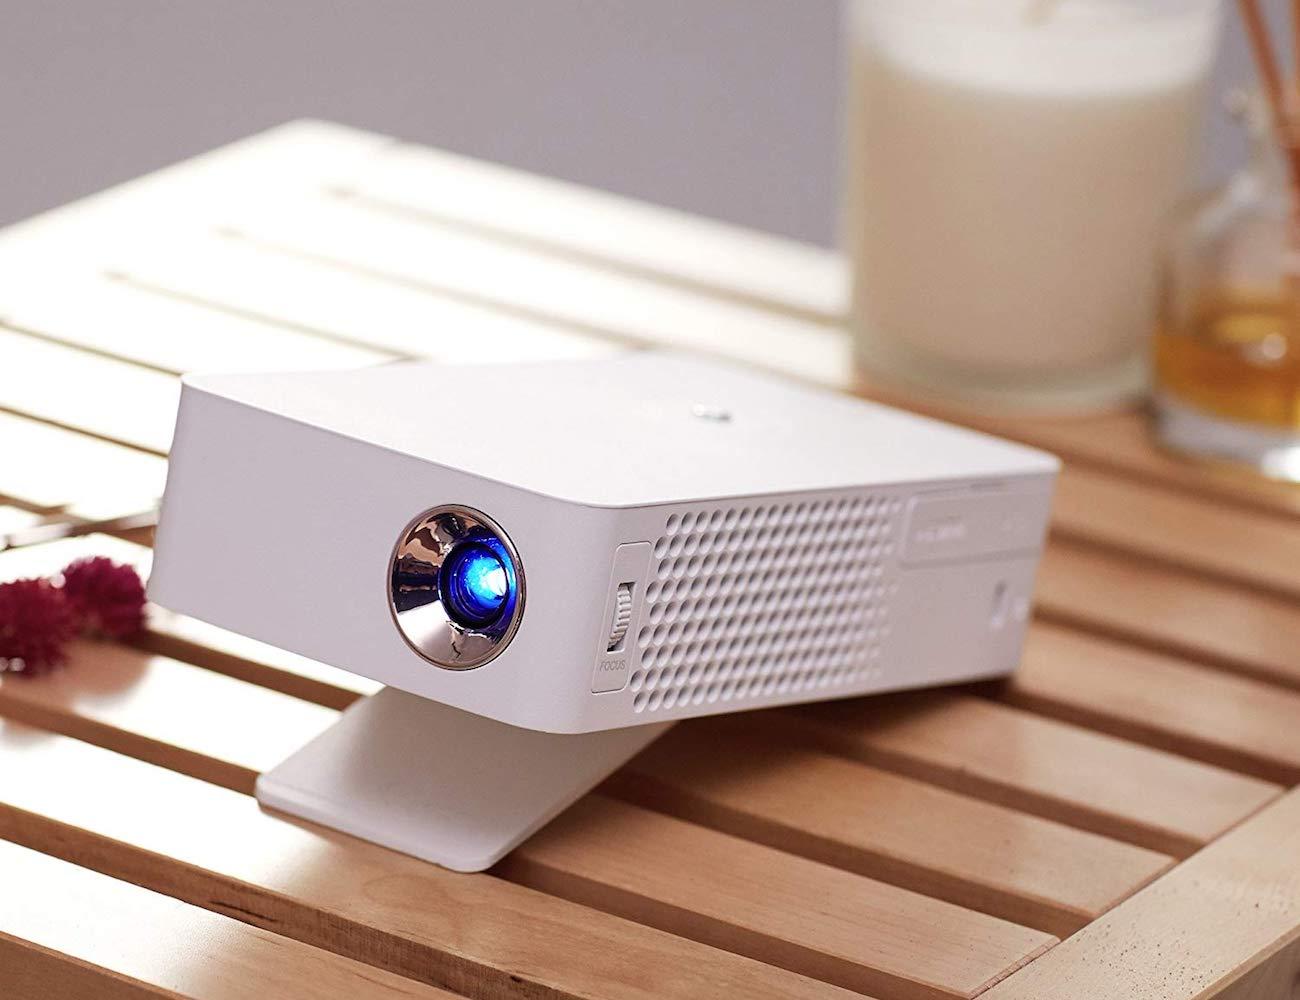 LG HD LED Portable MiniBeam Projector